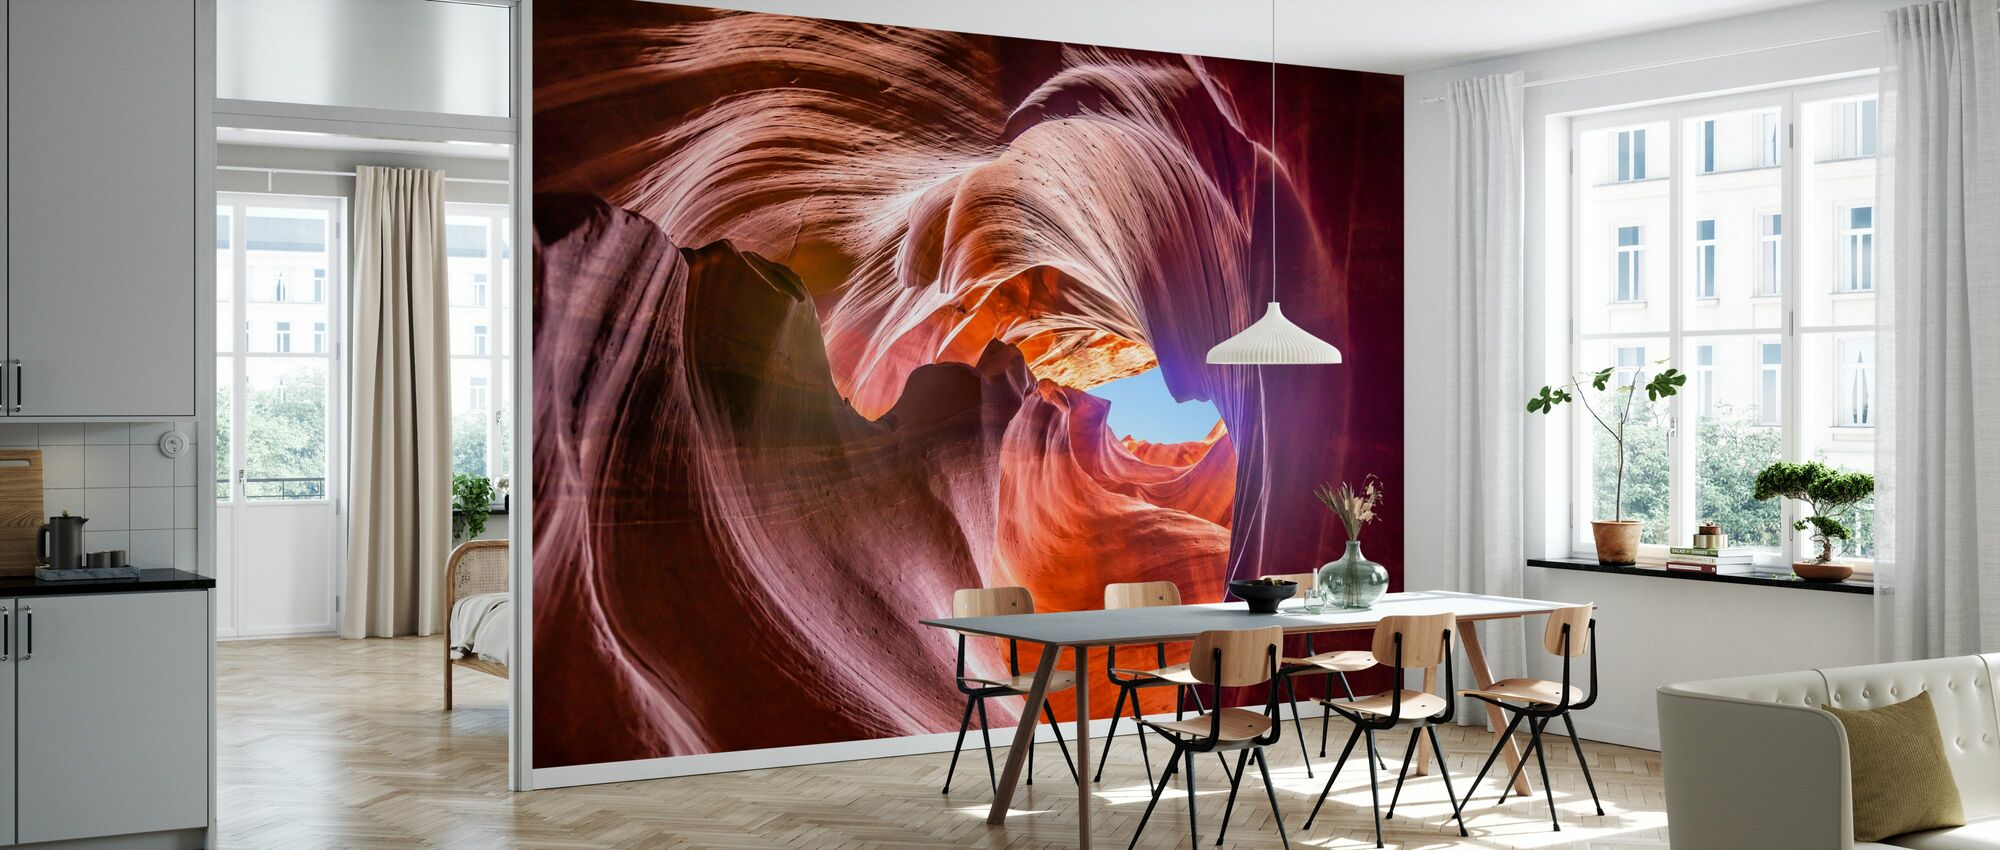 Upper Antelope Canyon - Wallpaper - Kitchen